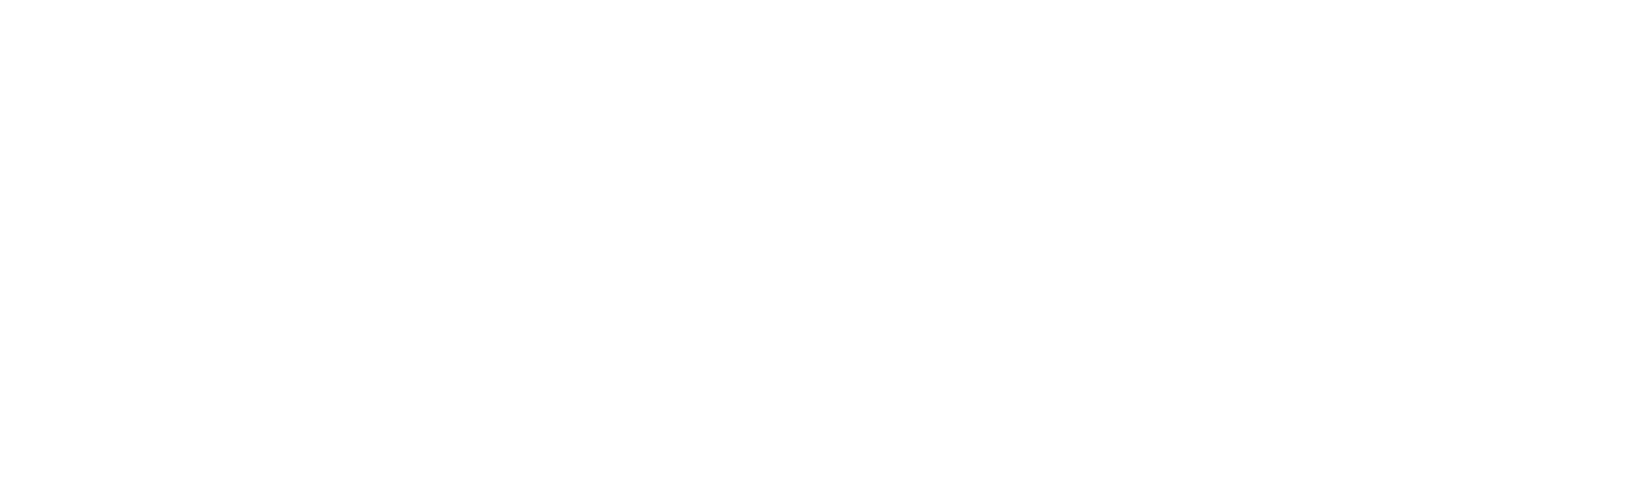 days-gone-logo-01-ps4-us-12dec18?$native$